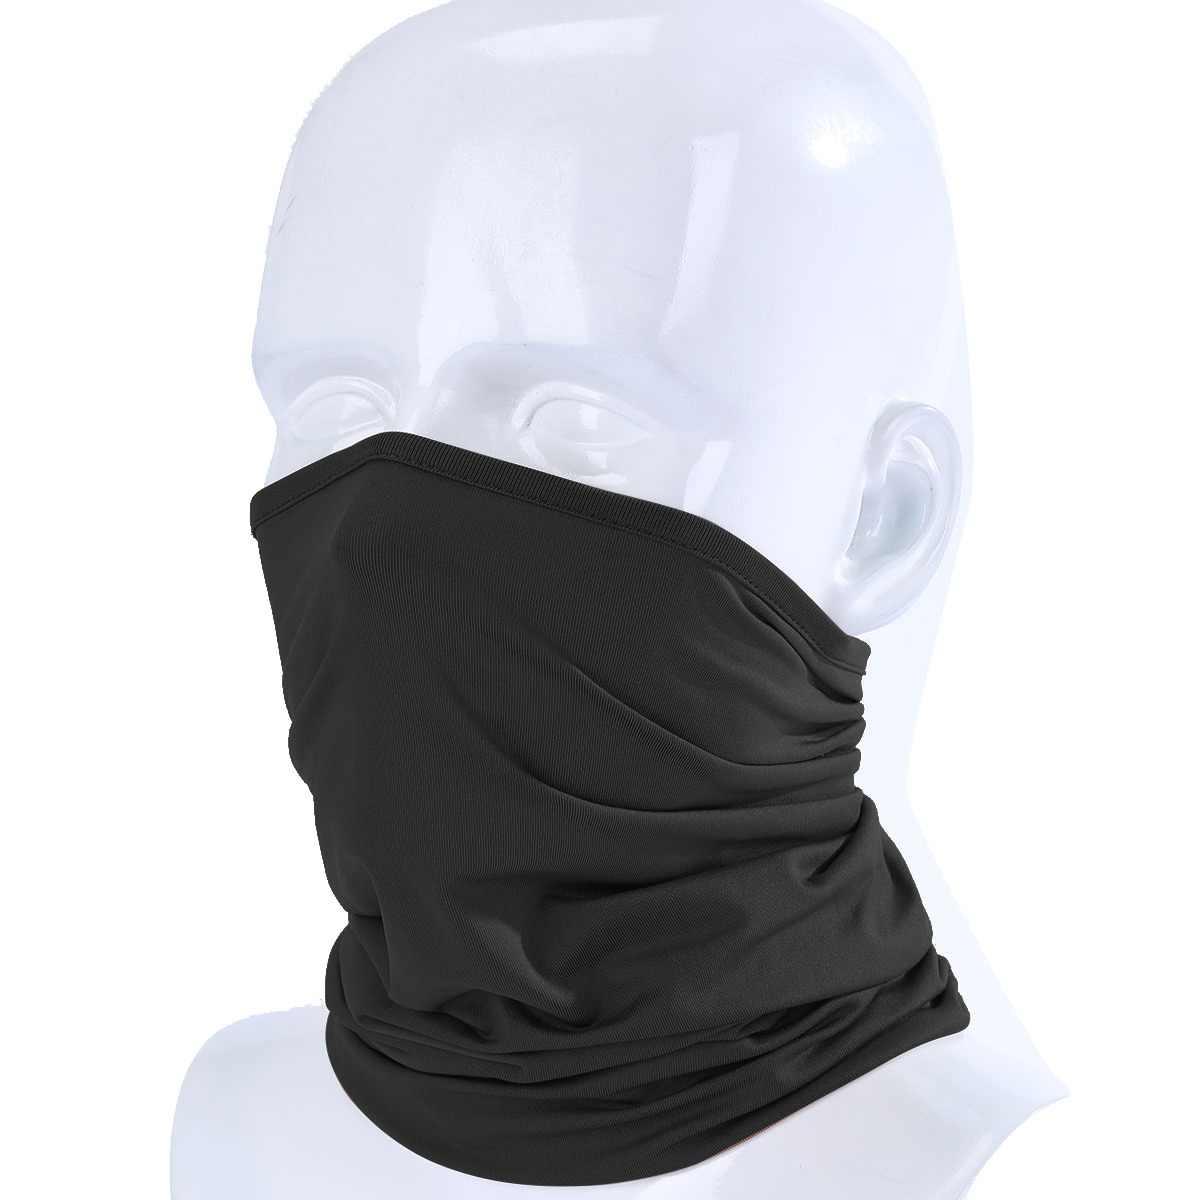 e0f6aeae5ad Magic Headband Elastic Breathable Neck Gaiter Warmer Tube Scarf Half Face  Mask Bandana Headwear Bicycle Sweatband